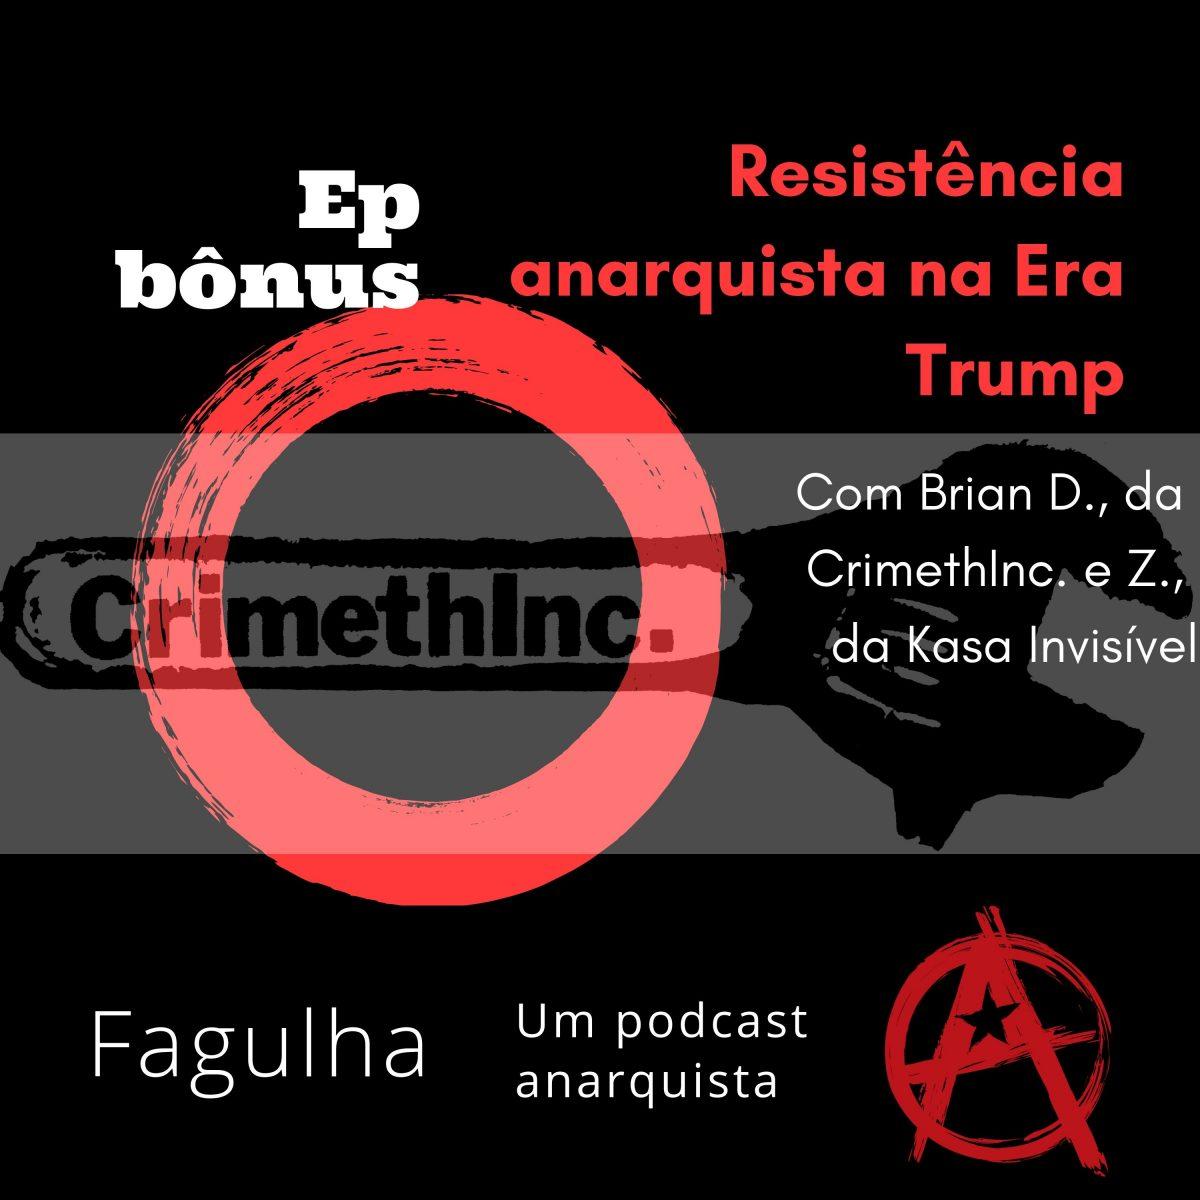 Bônus: Resistência anarquista na Era Trump